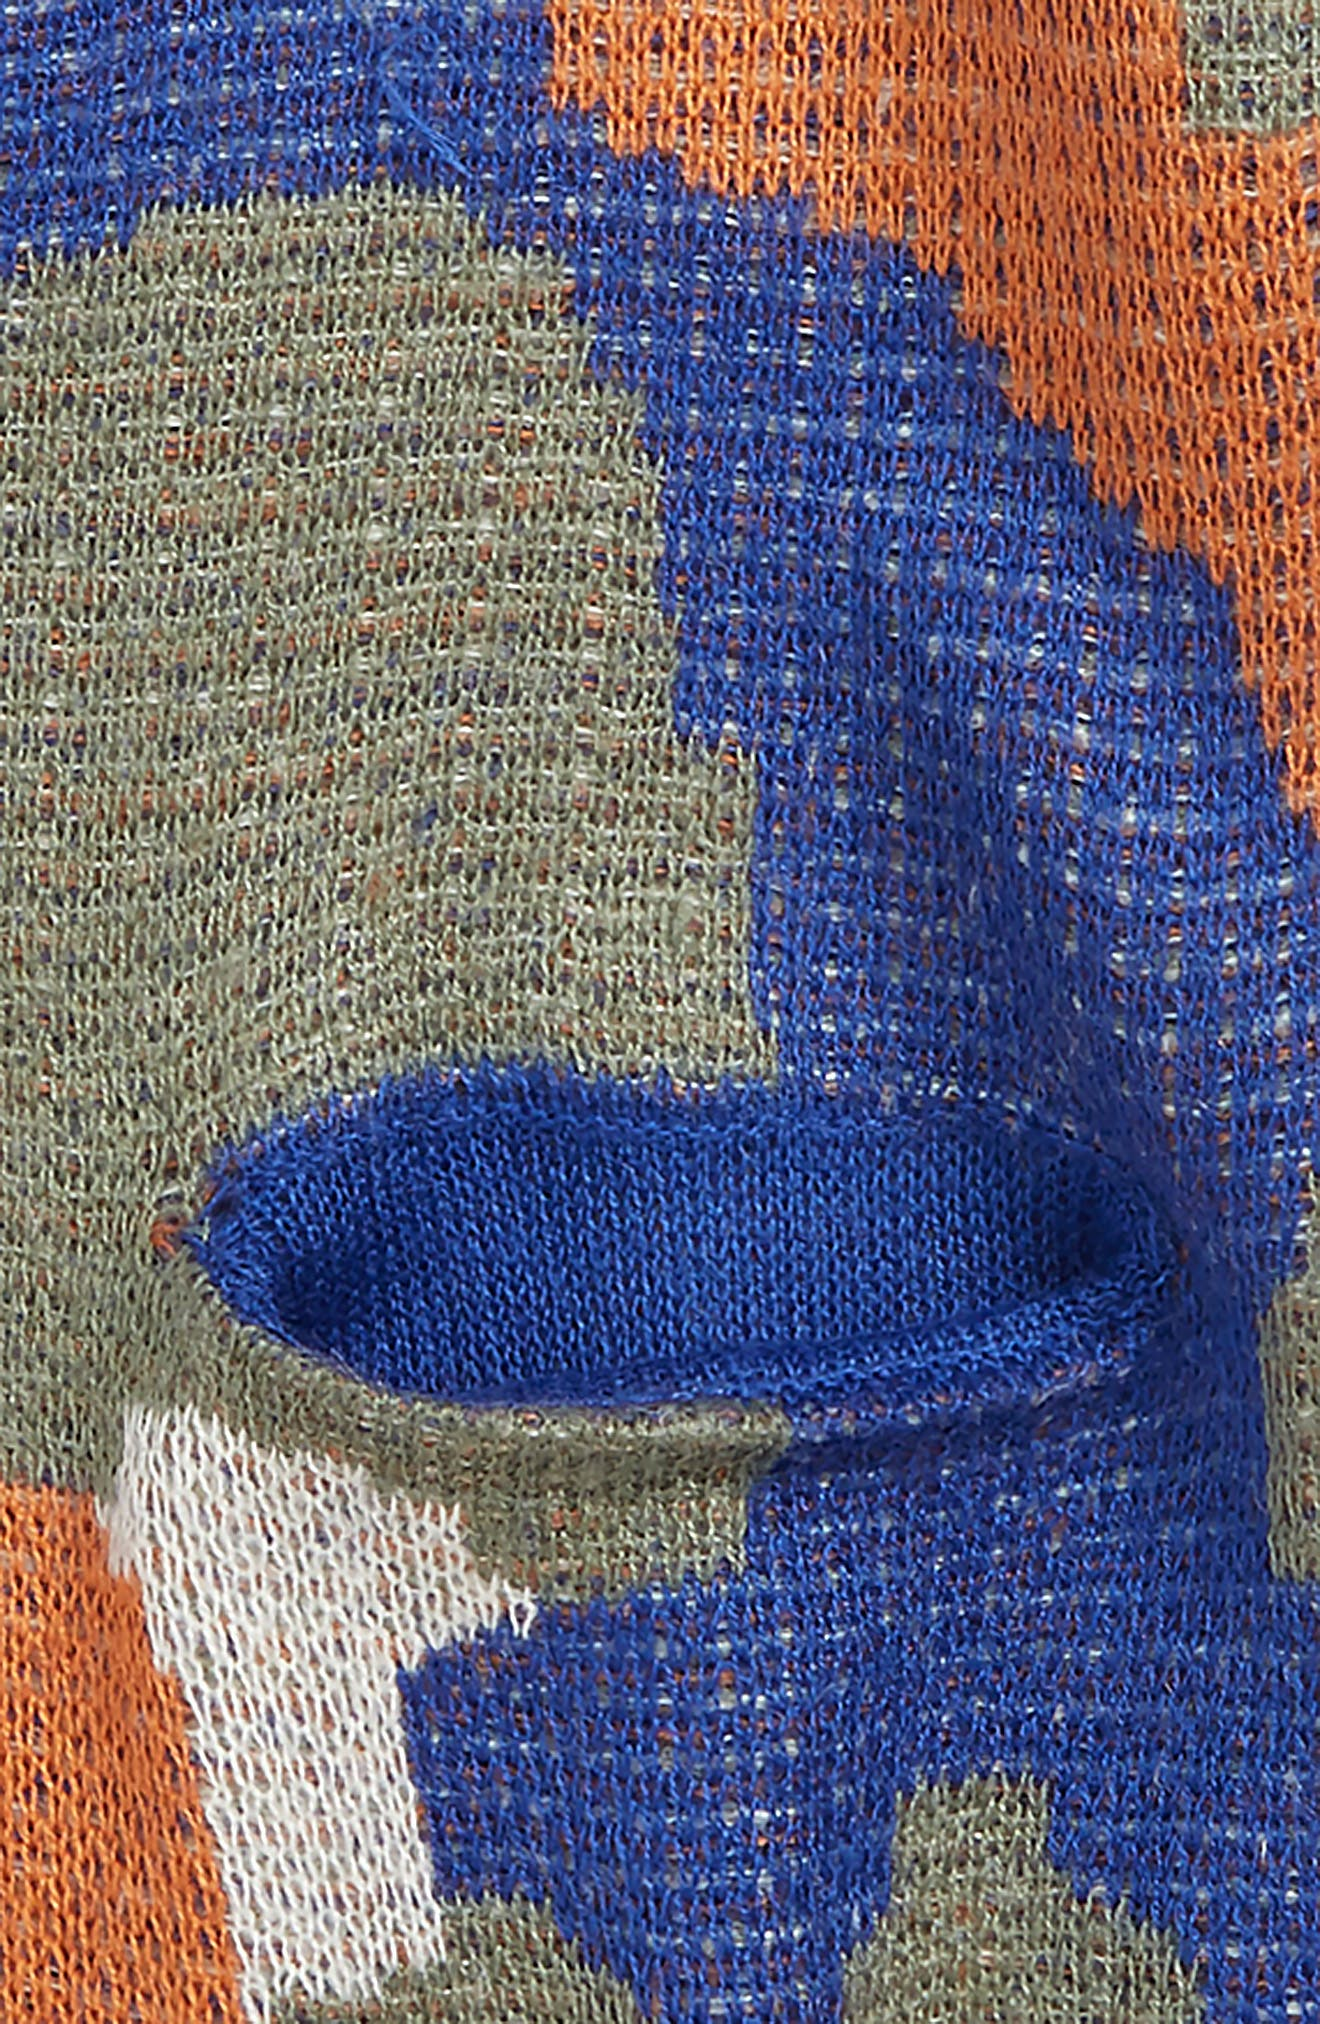 Abstract Cardigan,                             Alternate thumbnail 2, color,                             BLUE MAZARINE CAMO